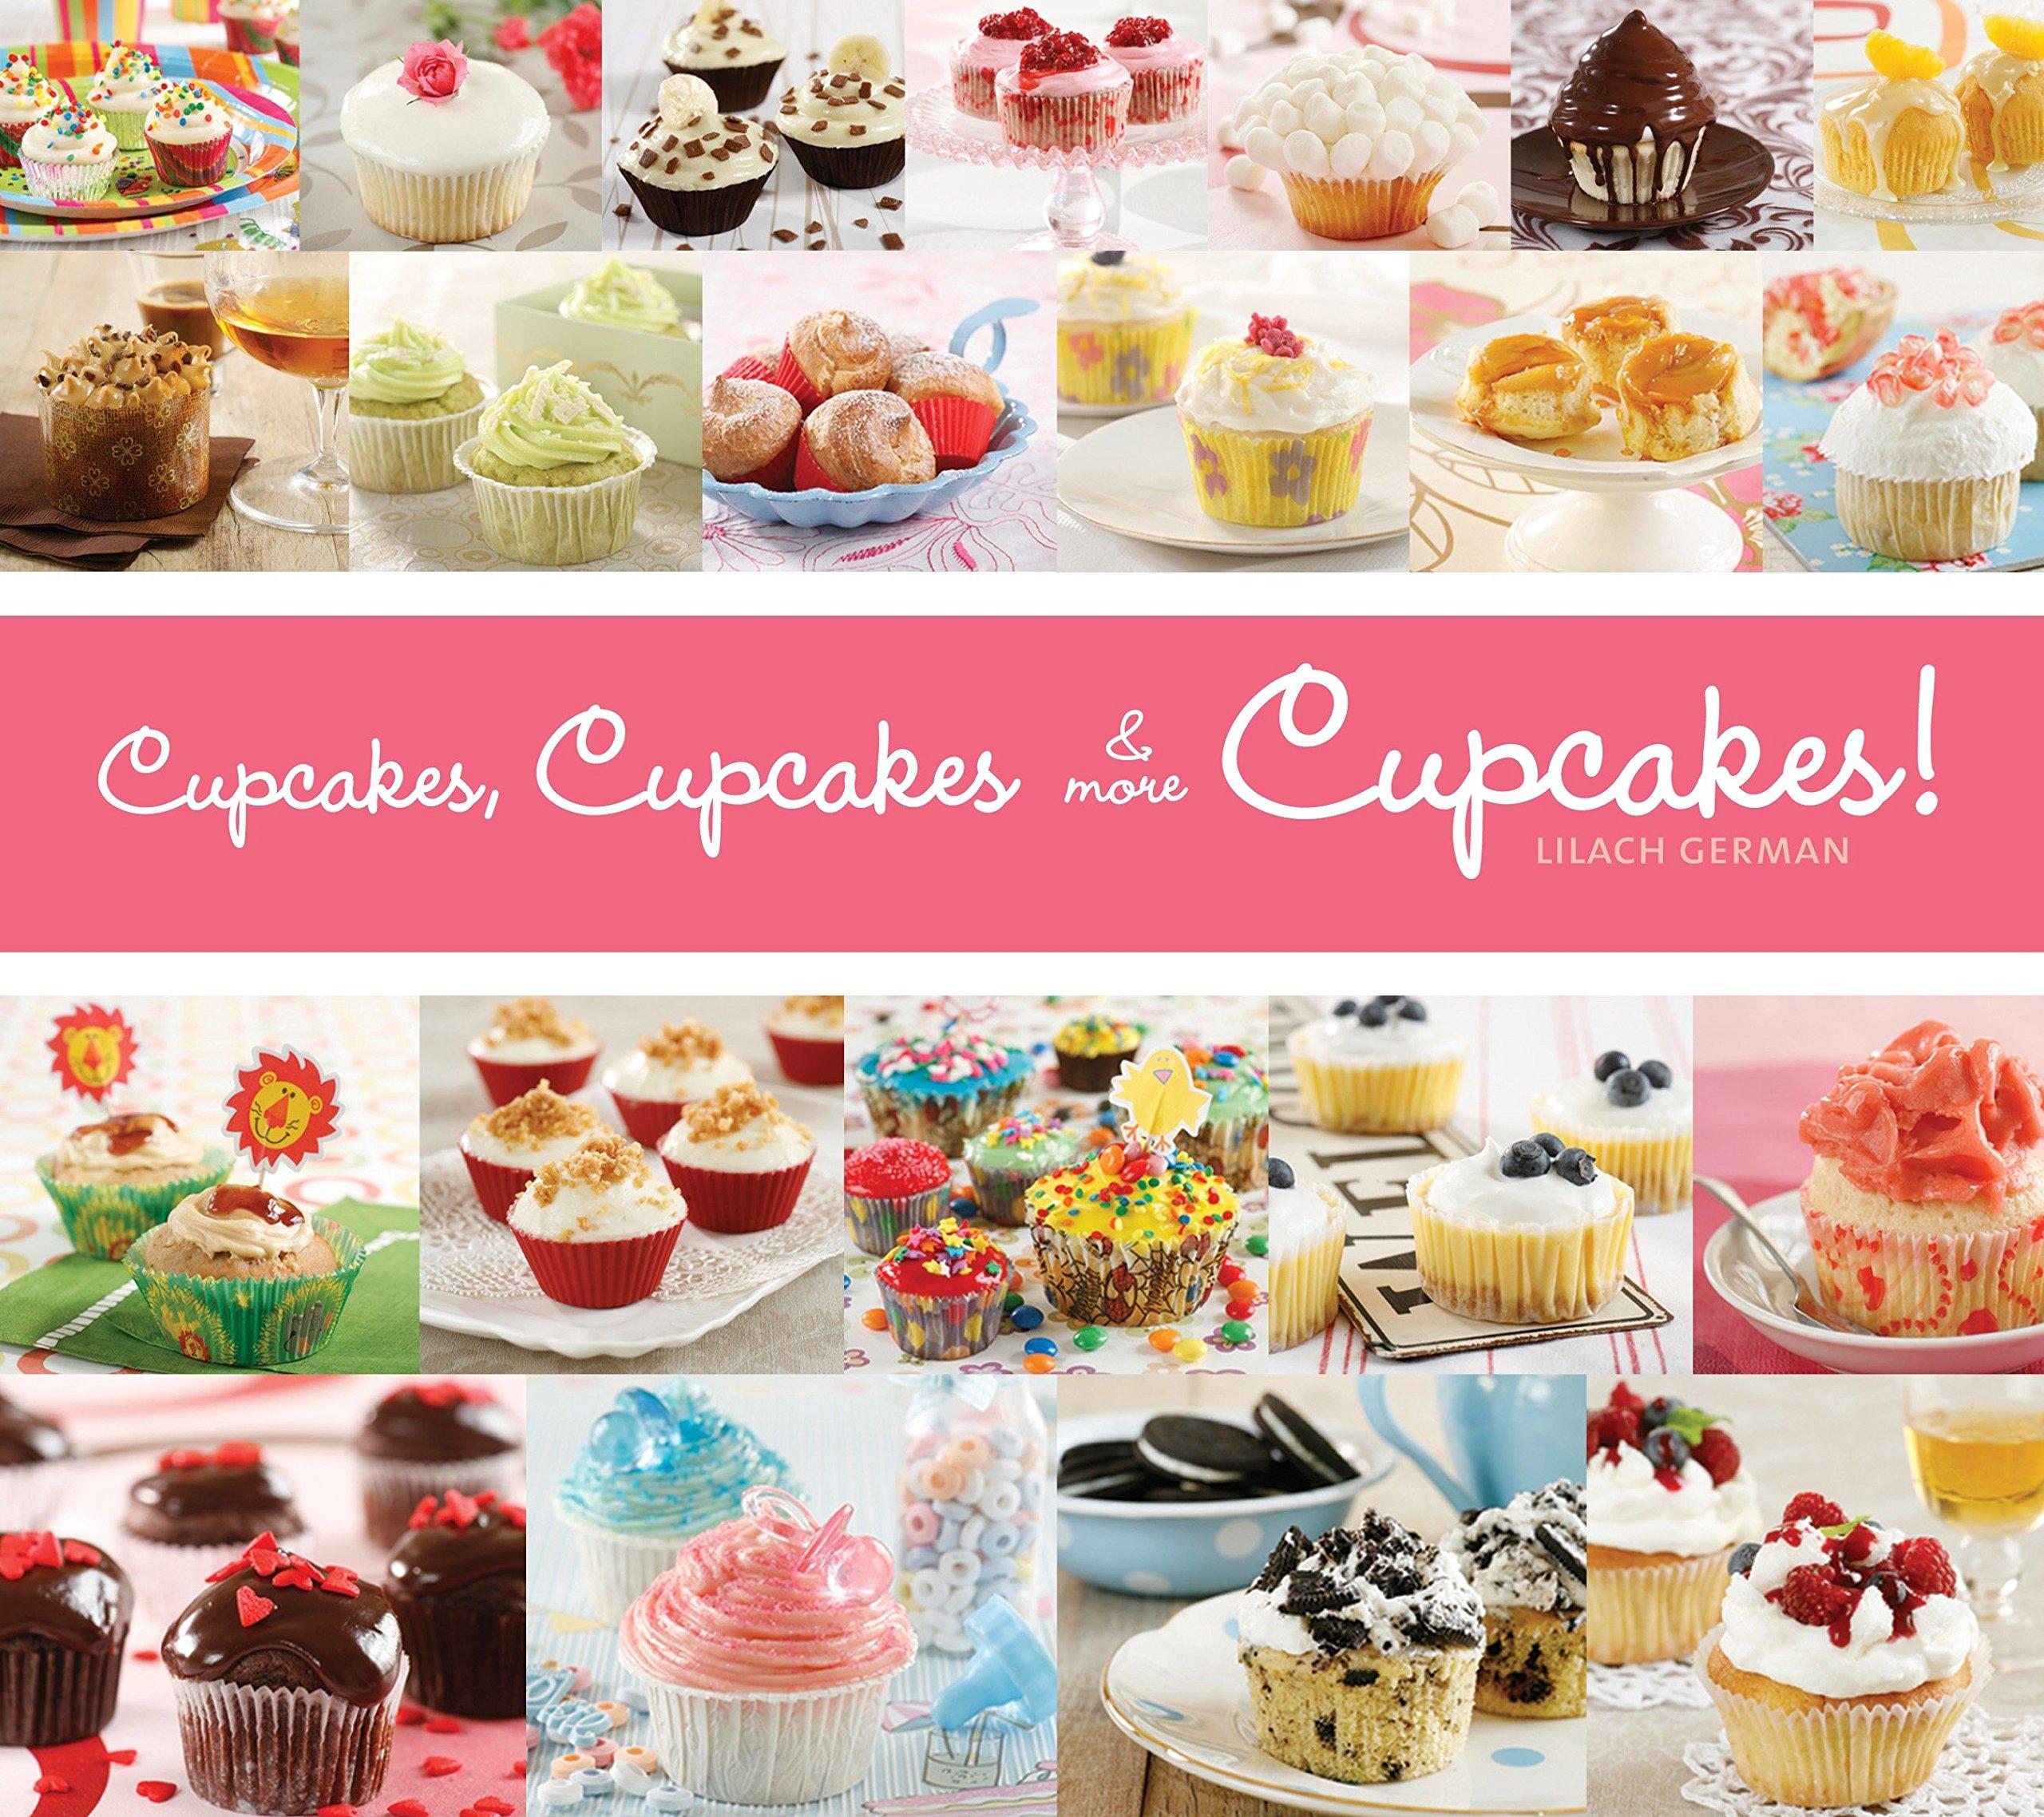 Cupcakes, Cupcakes & More Cupcakes!: Amazon.es: Lilach German: Libros en idiomas extranjeros